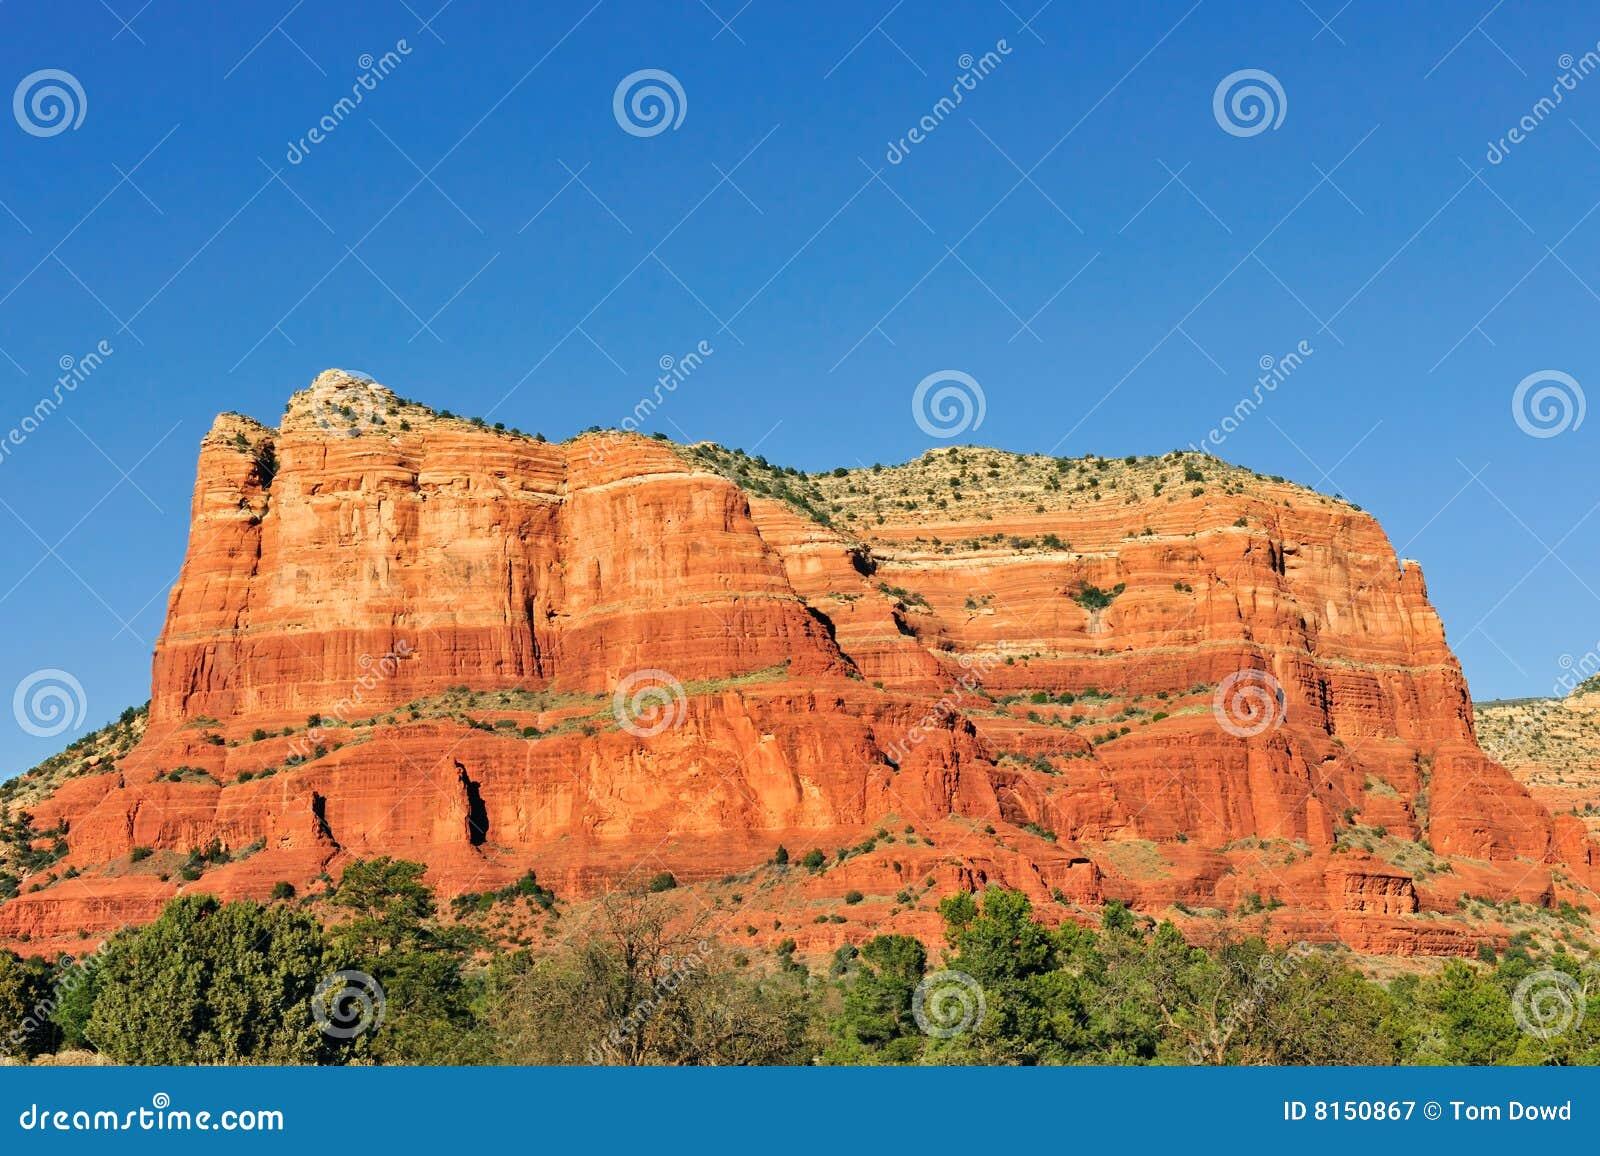 Mesa Rock Formation Arizona Stock Image Image Of